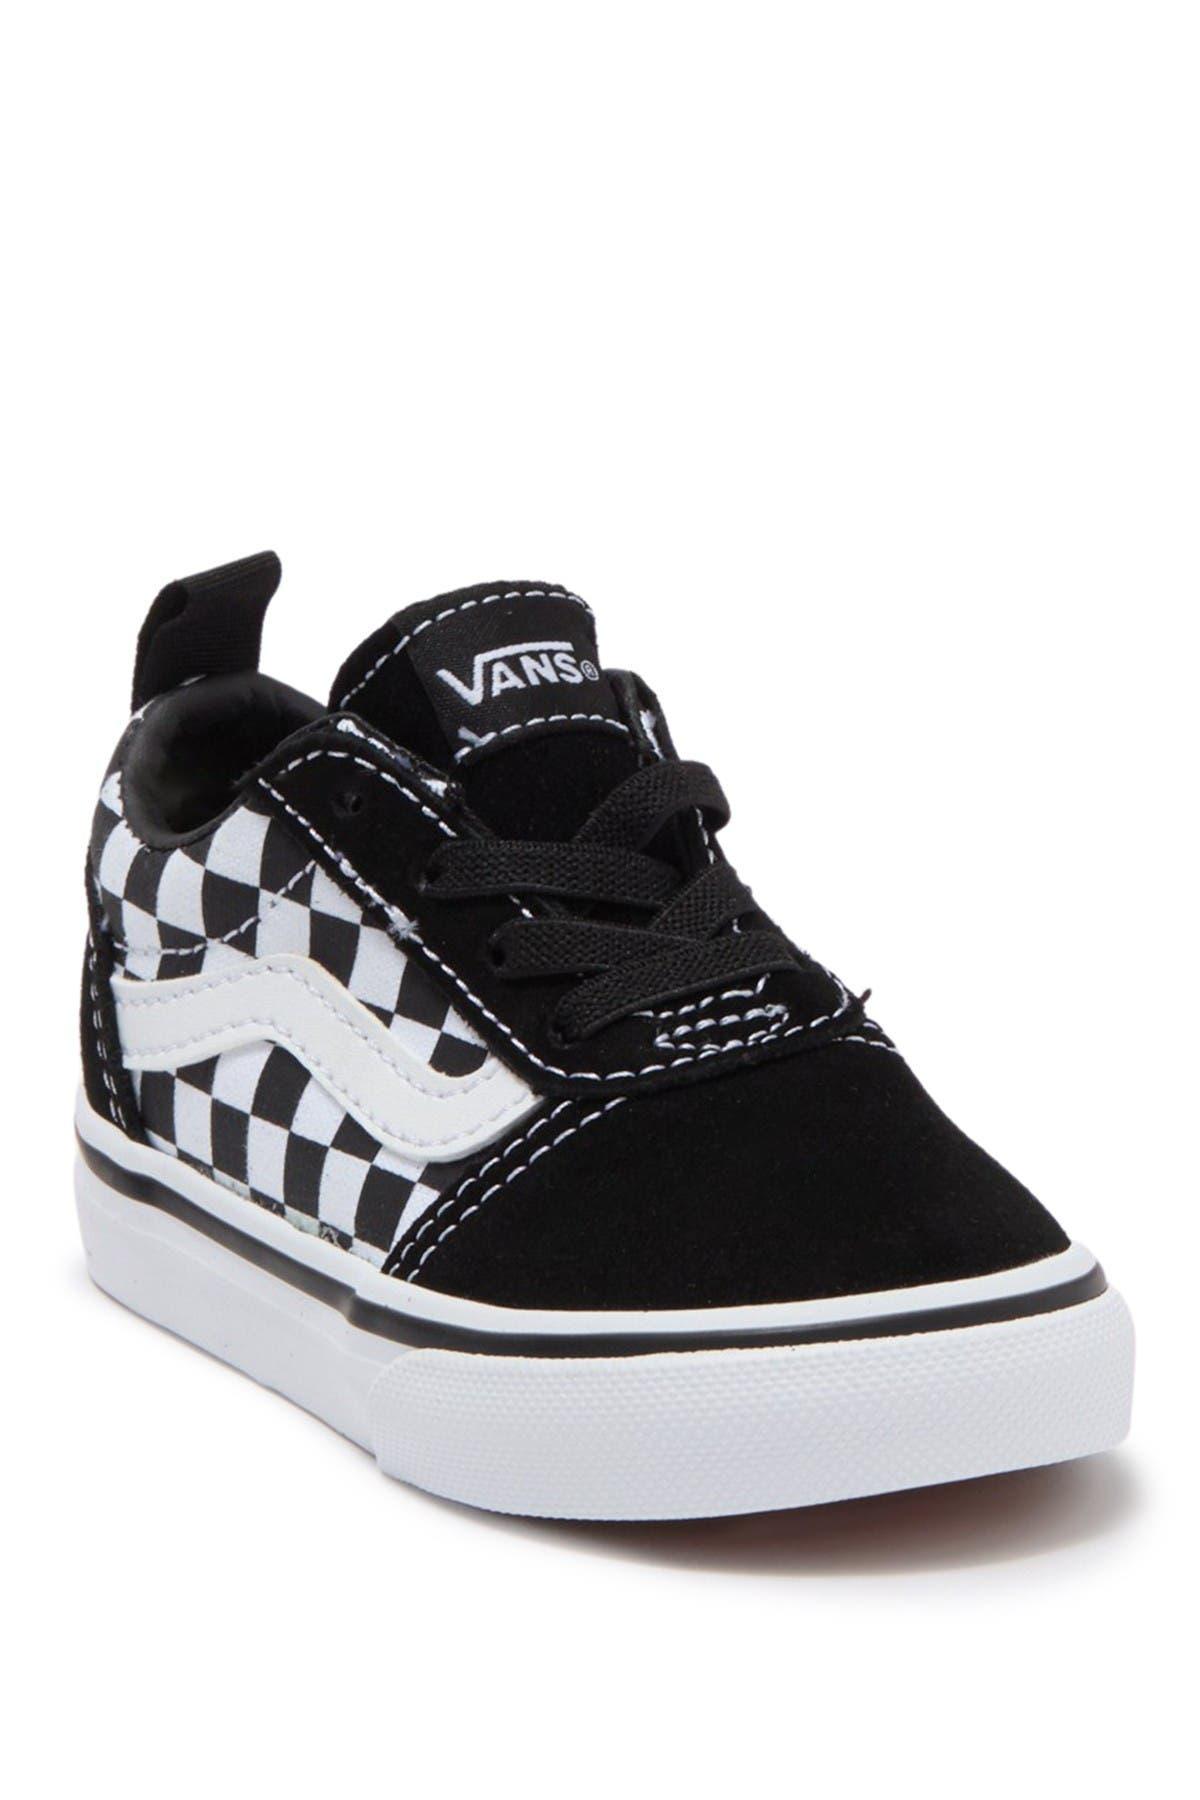 Image of VANS Ward Checkered Sneaker